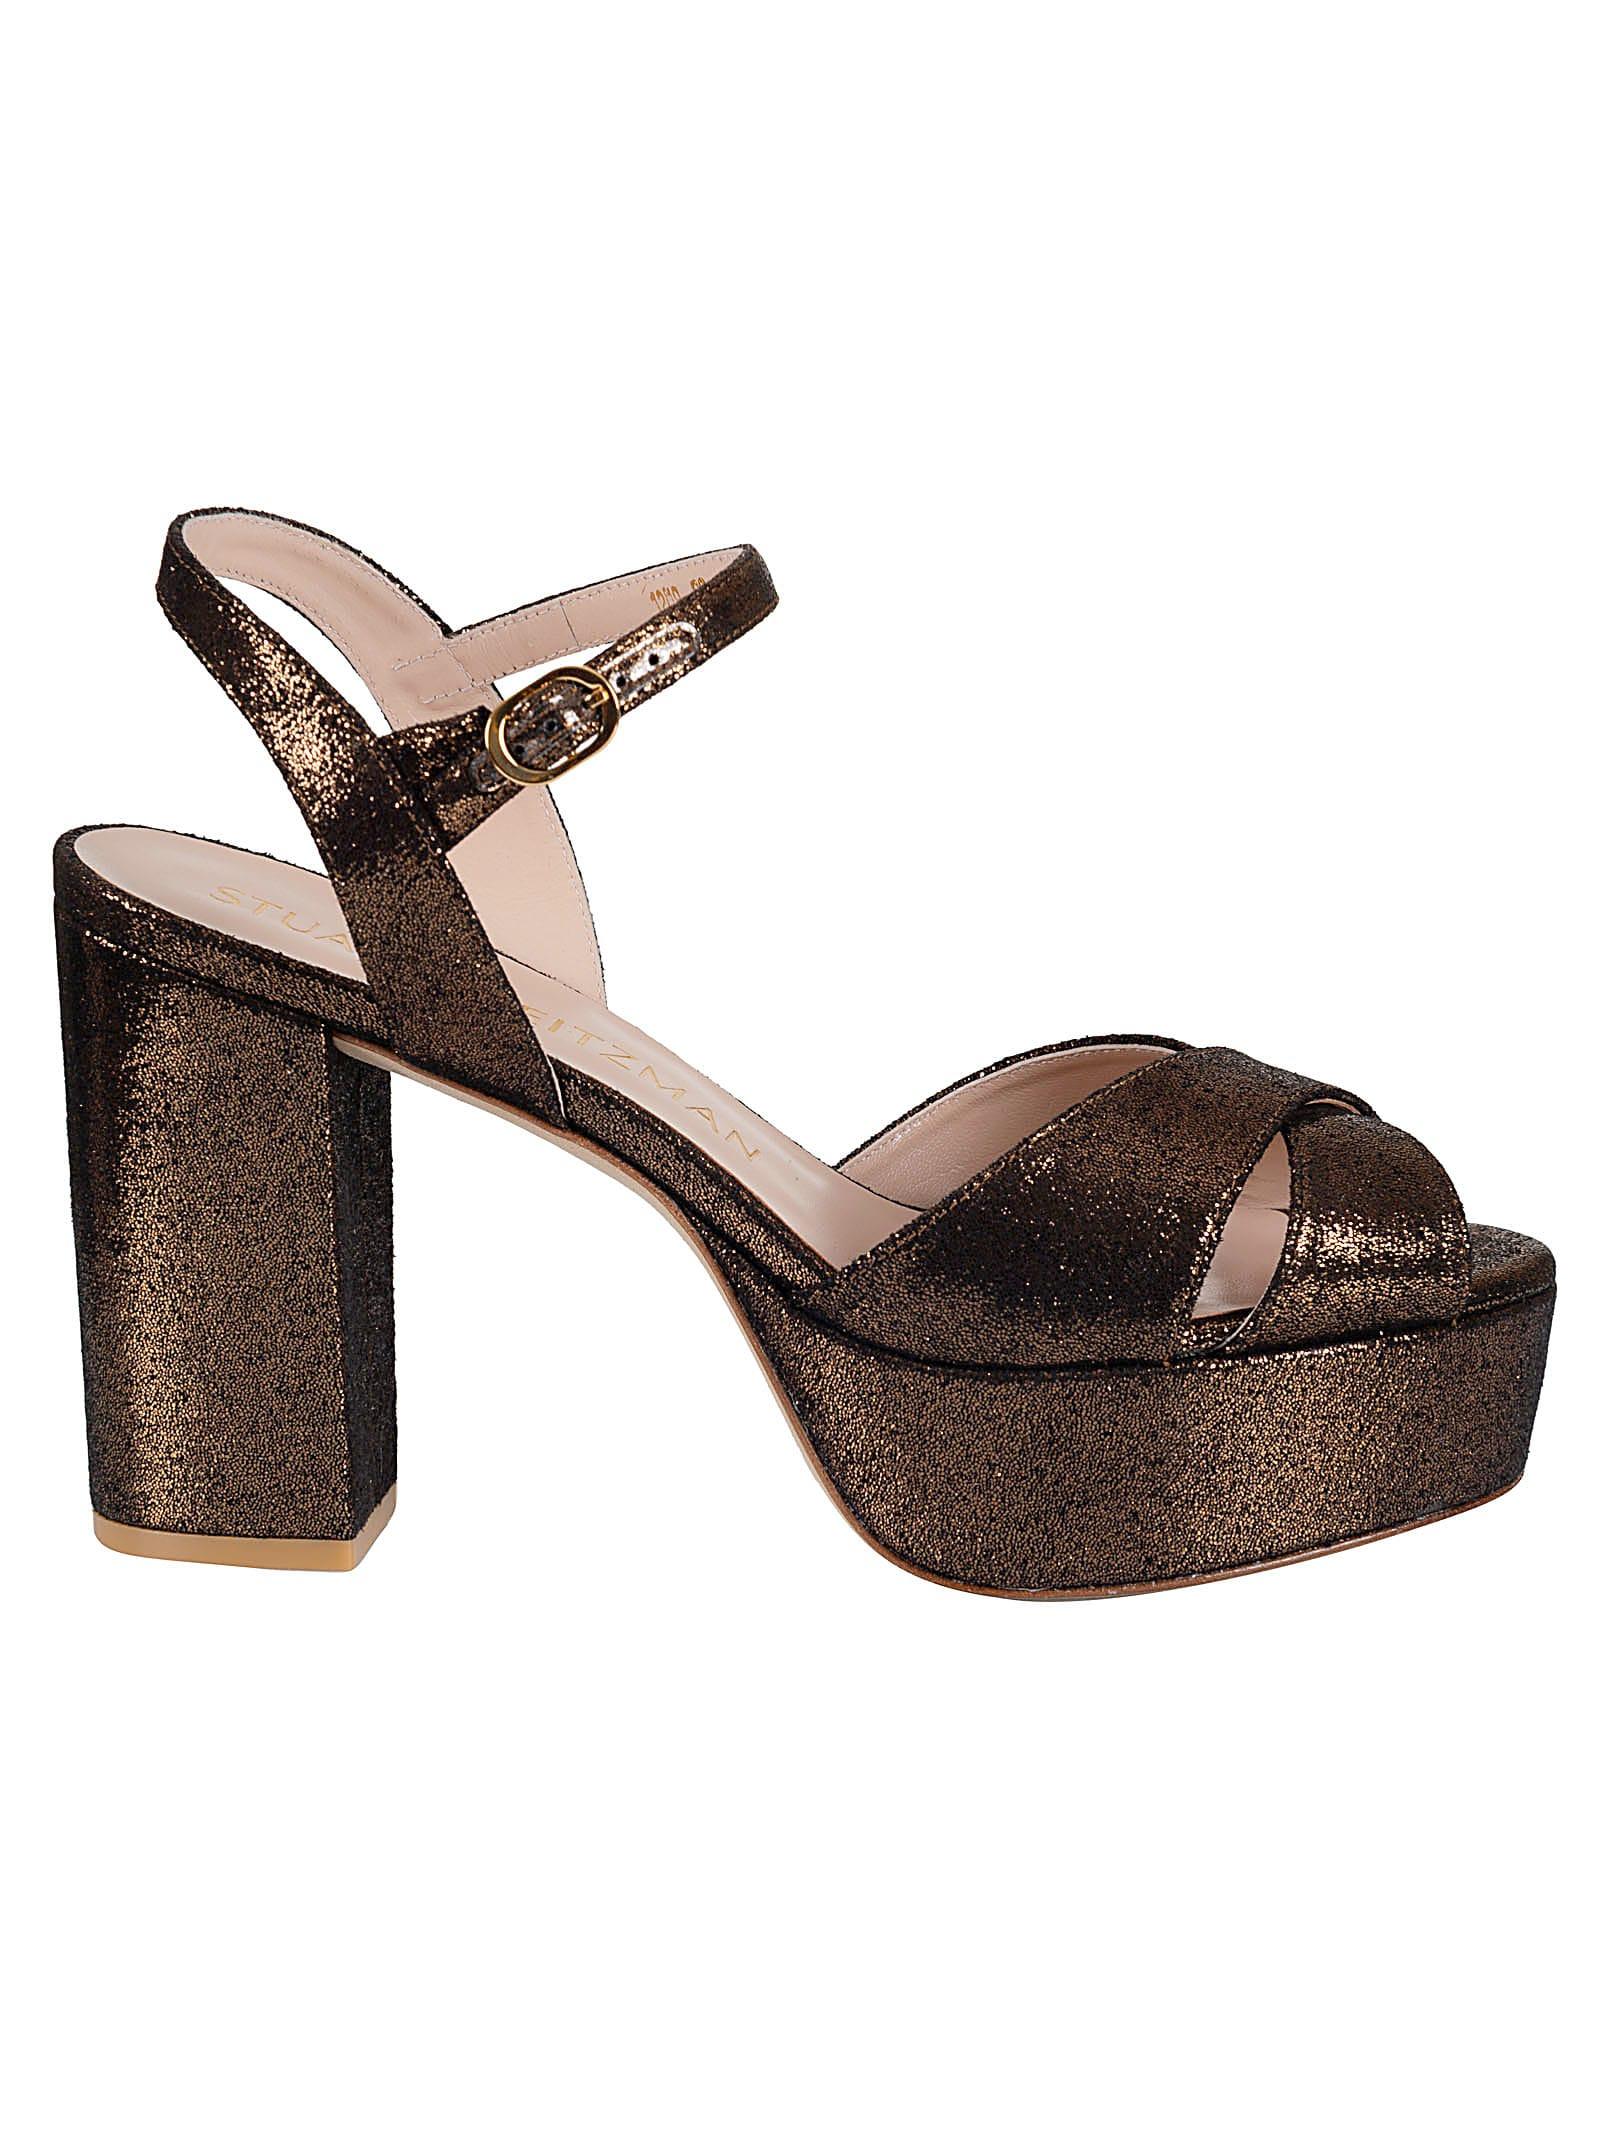 Buy Stuart Weitzman Ivona Sandals online, shop Stuart Weitzman shoes with free shipping